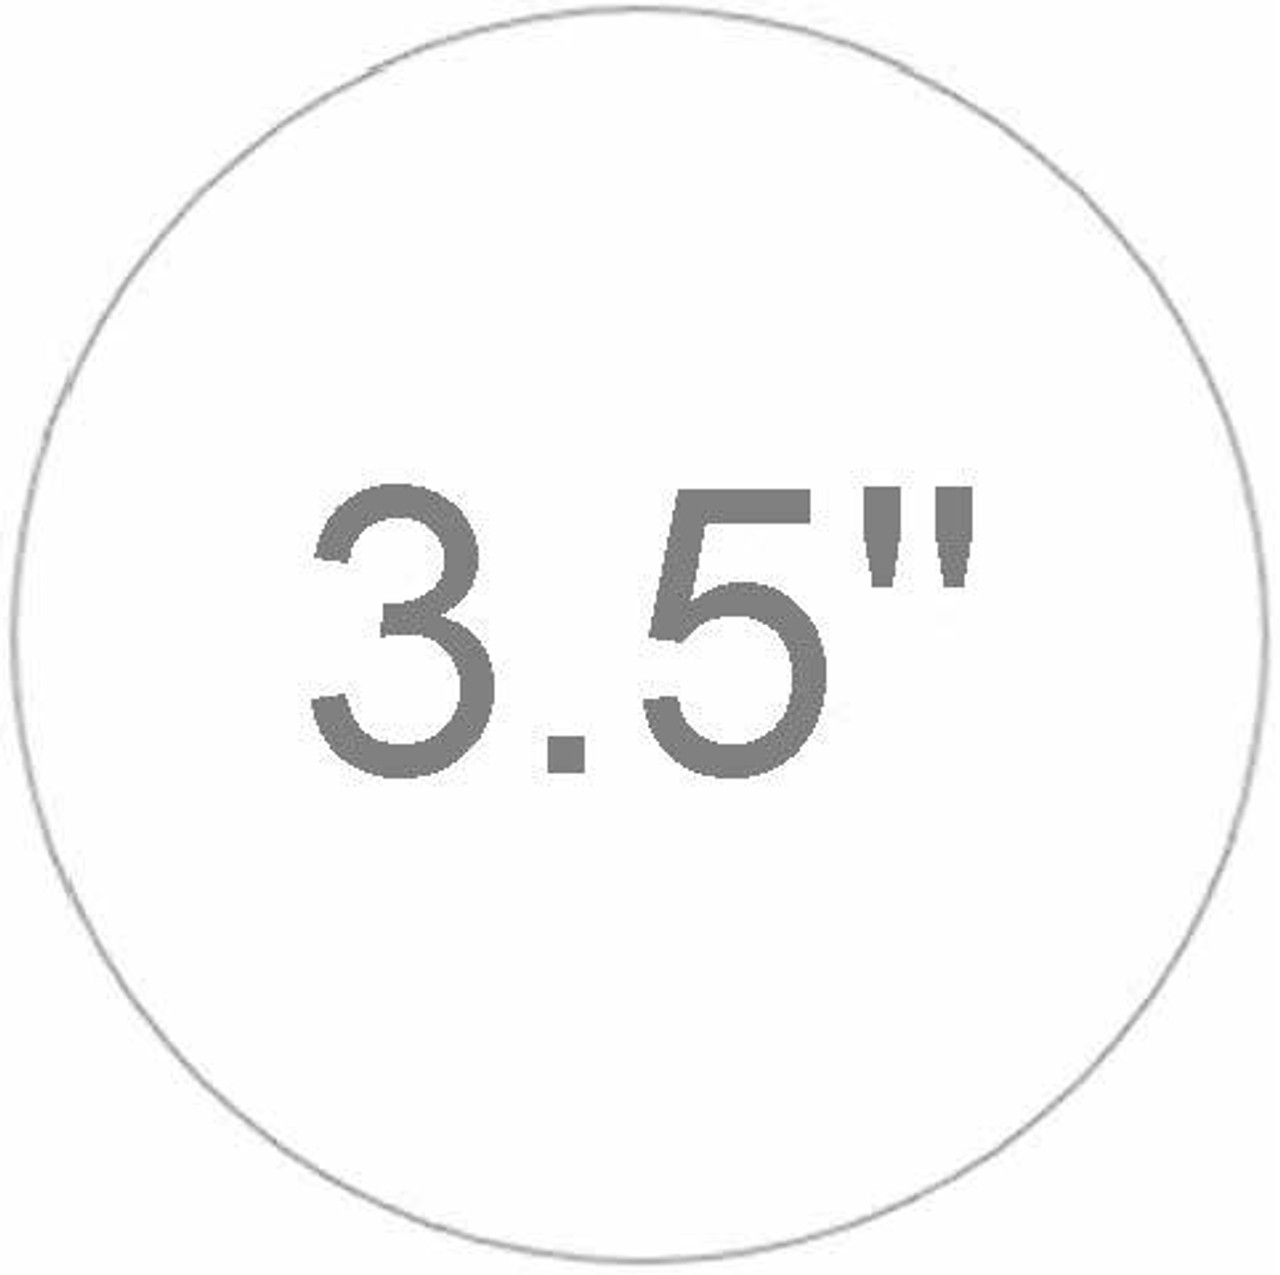 "3.5"" Probe Rod System"